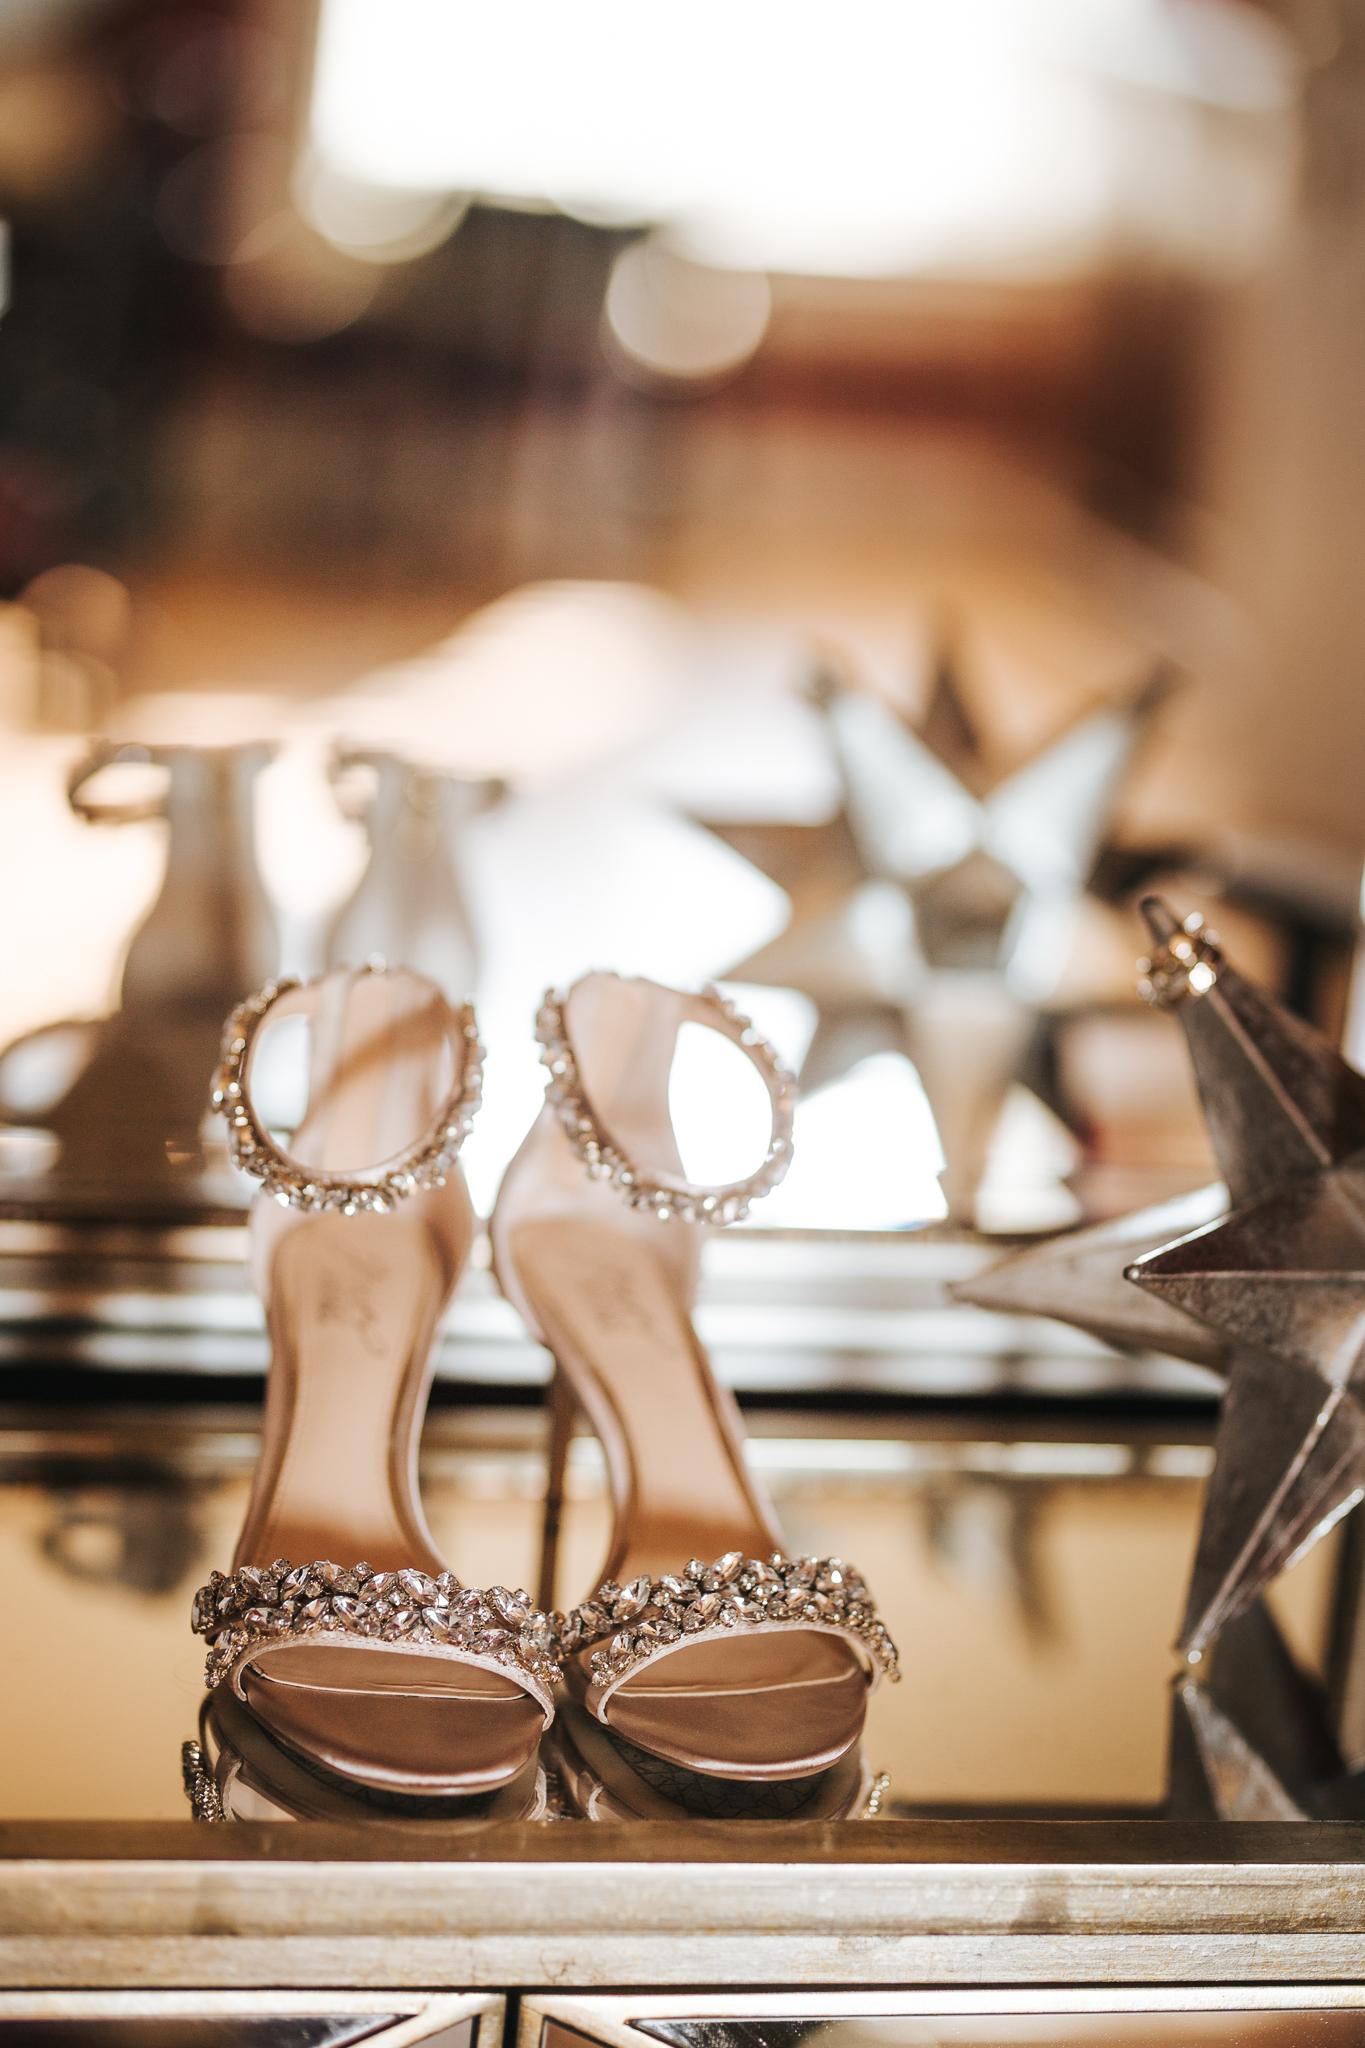 0002 Ariana Jordan Photo - Cameron & Lauren's Wedding at Talon Winery  3549.jpg